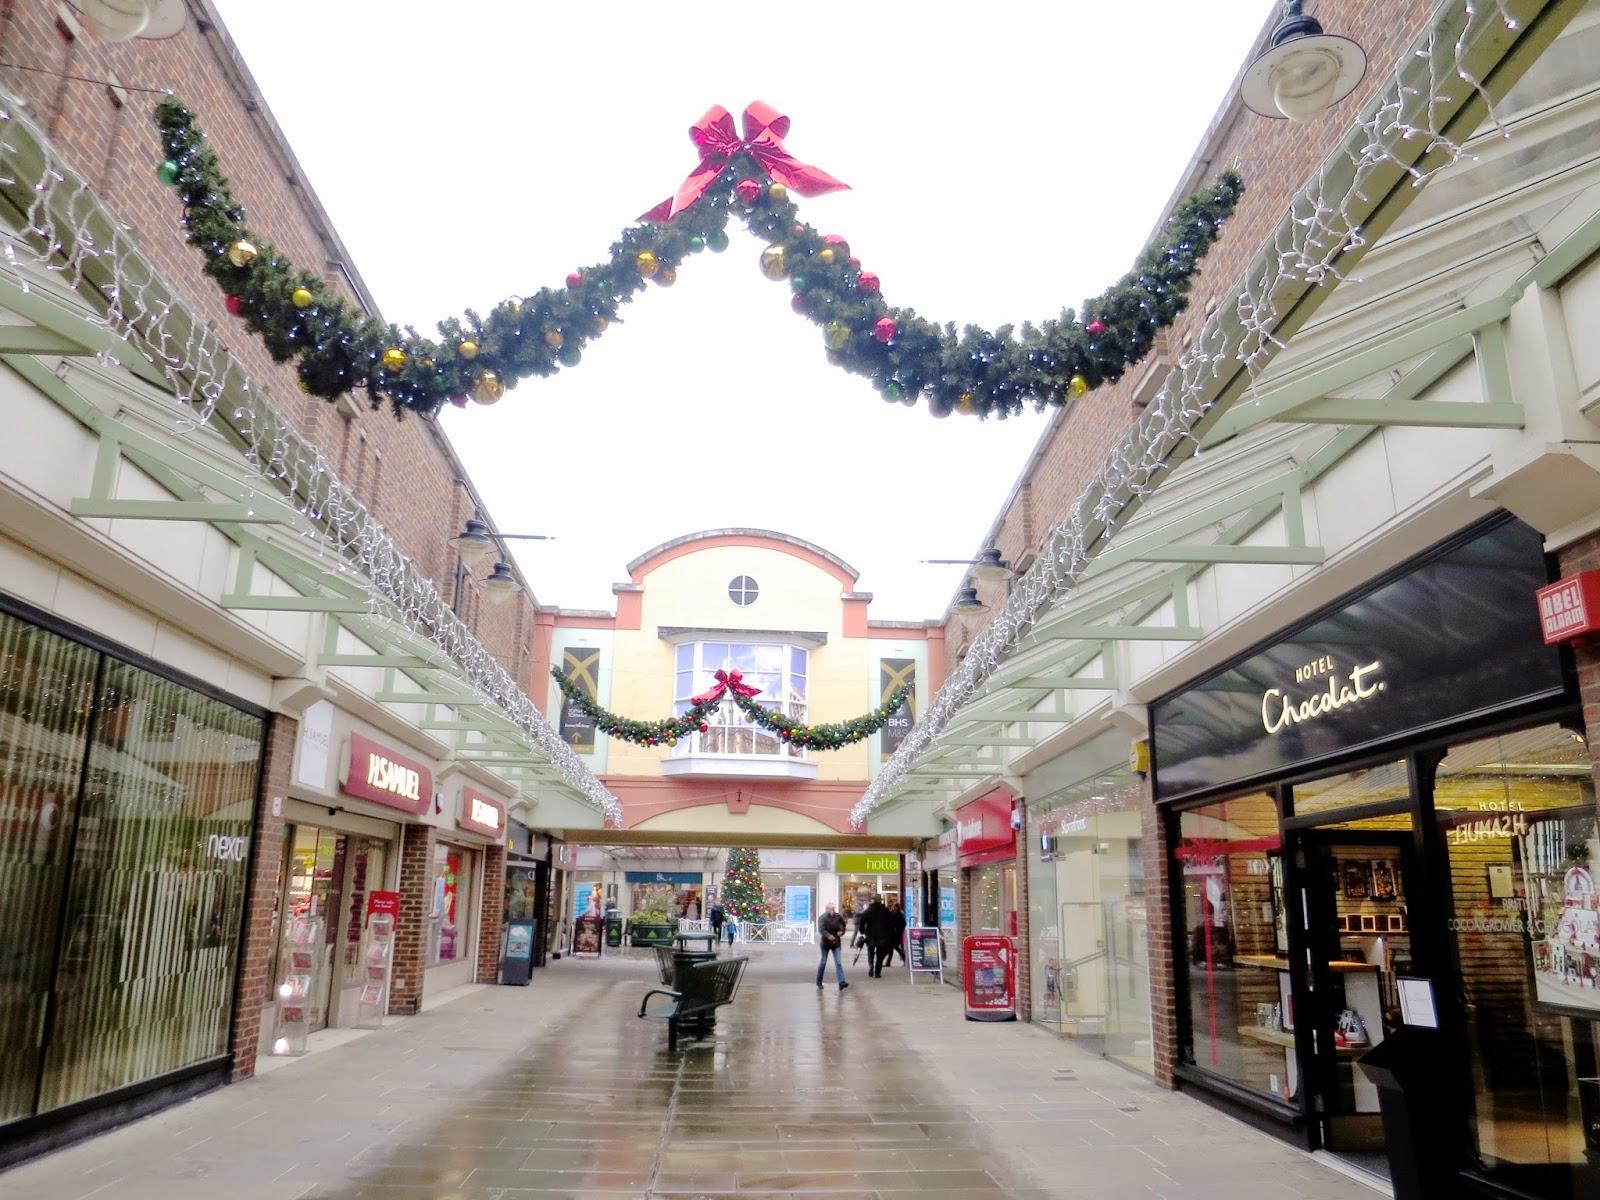 Christmas Shopping In Salisbury - Dizzybrunette